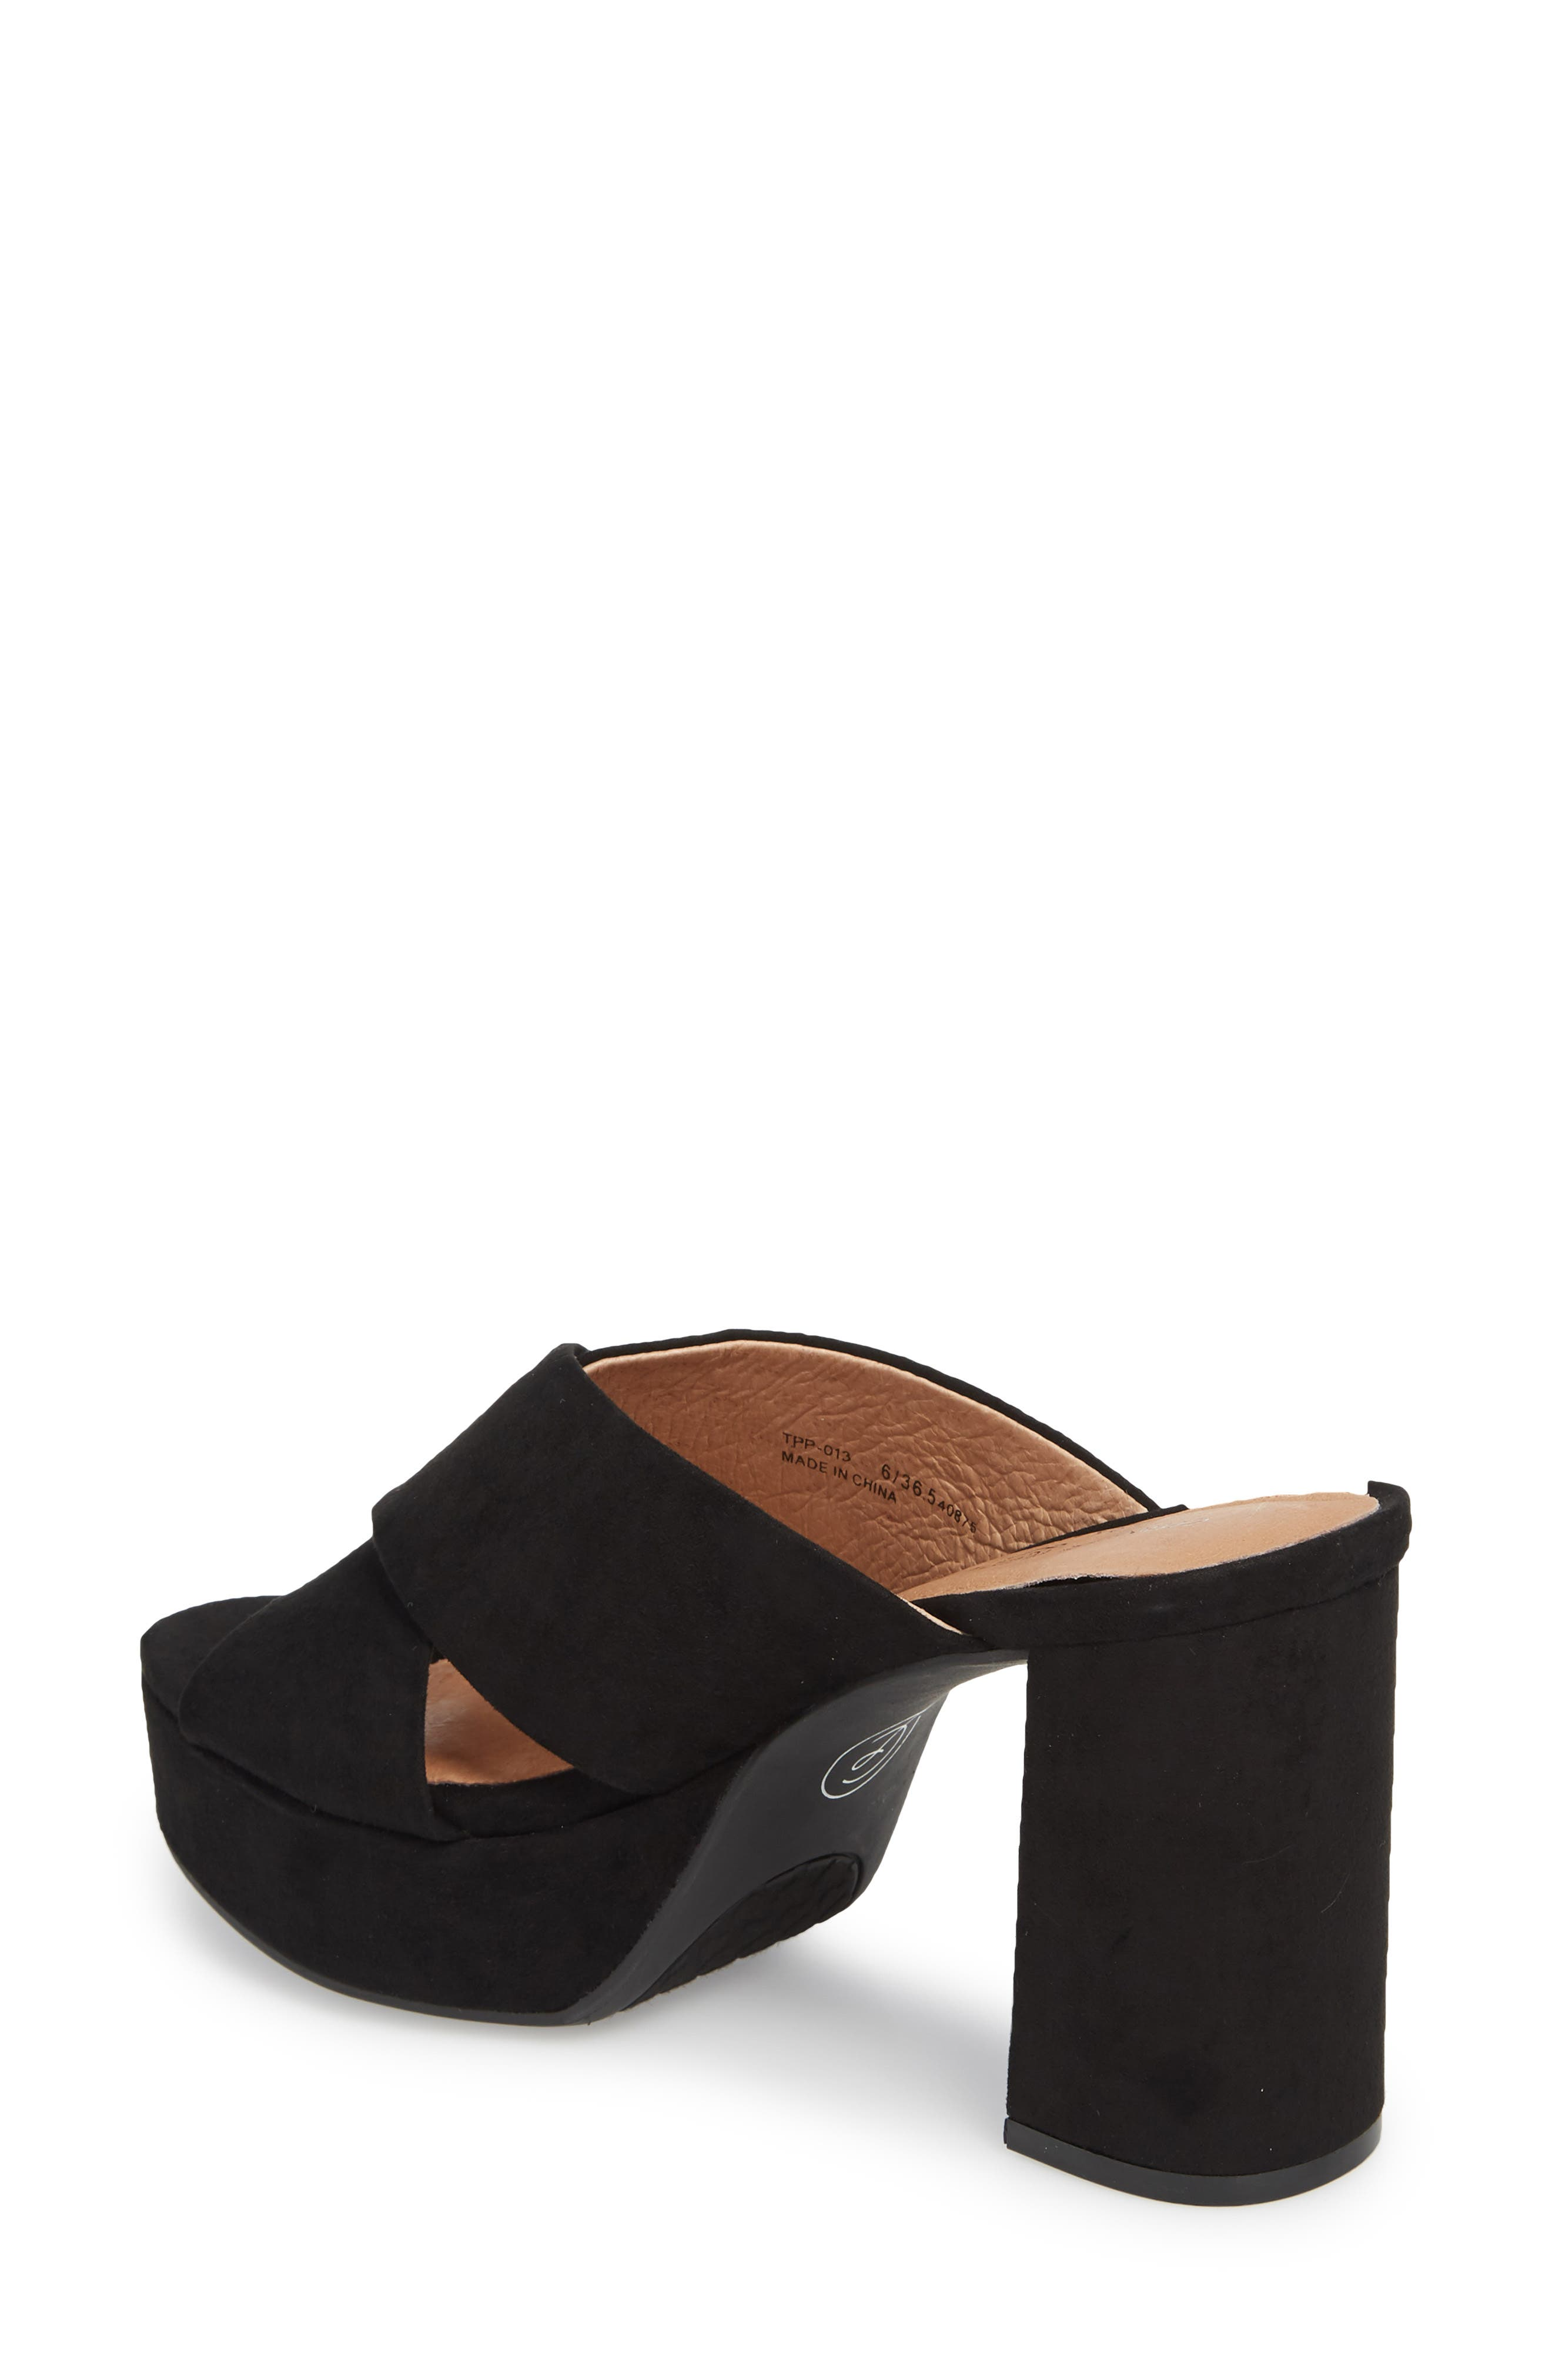 Teagan Cross Strap Platform Sandal,                             Alternate thumbnail 2, color,                             BLACK